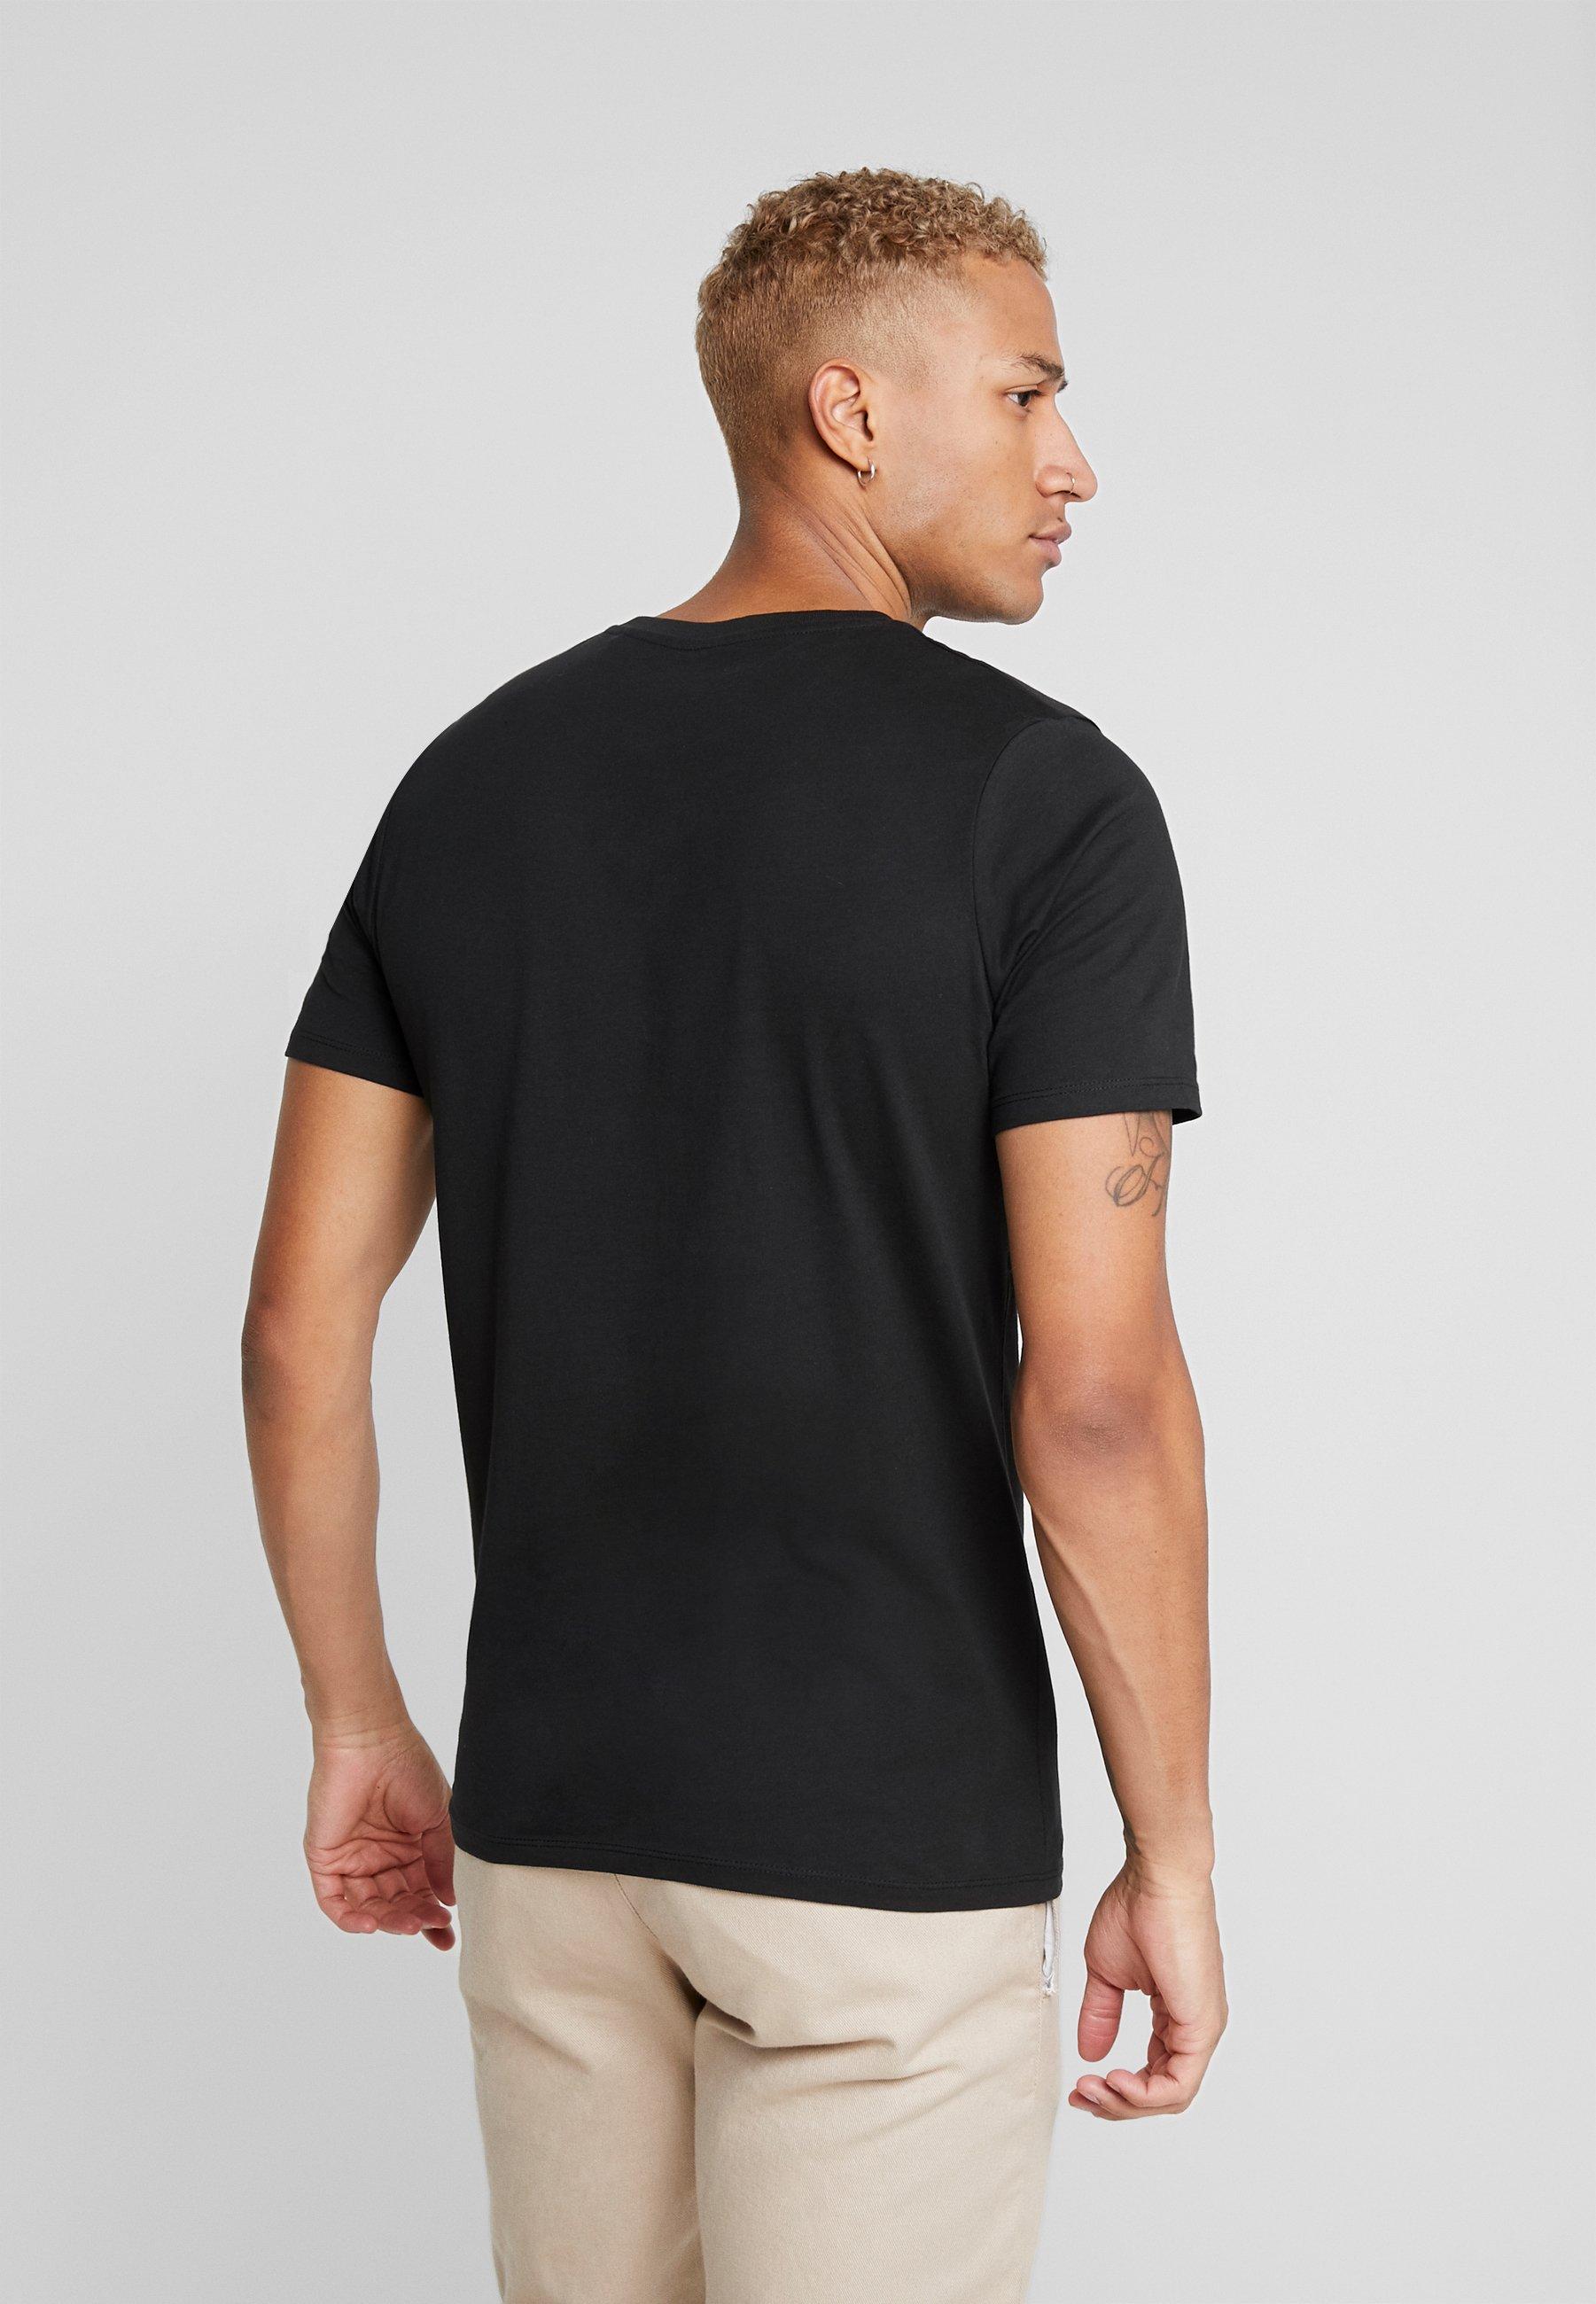 Jack & Jones JJEDENIM LOGO TEE O-NECK - Basic T-shirt - black/white nJzPa